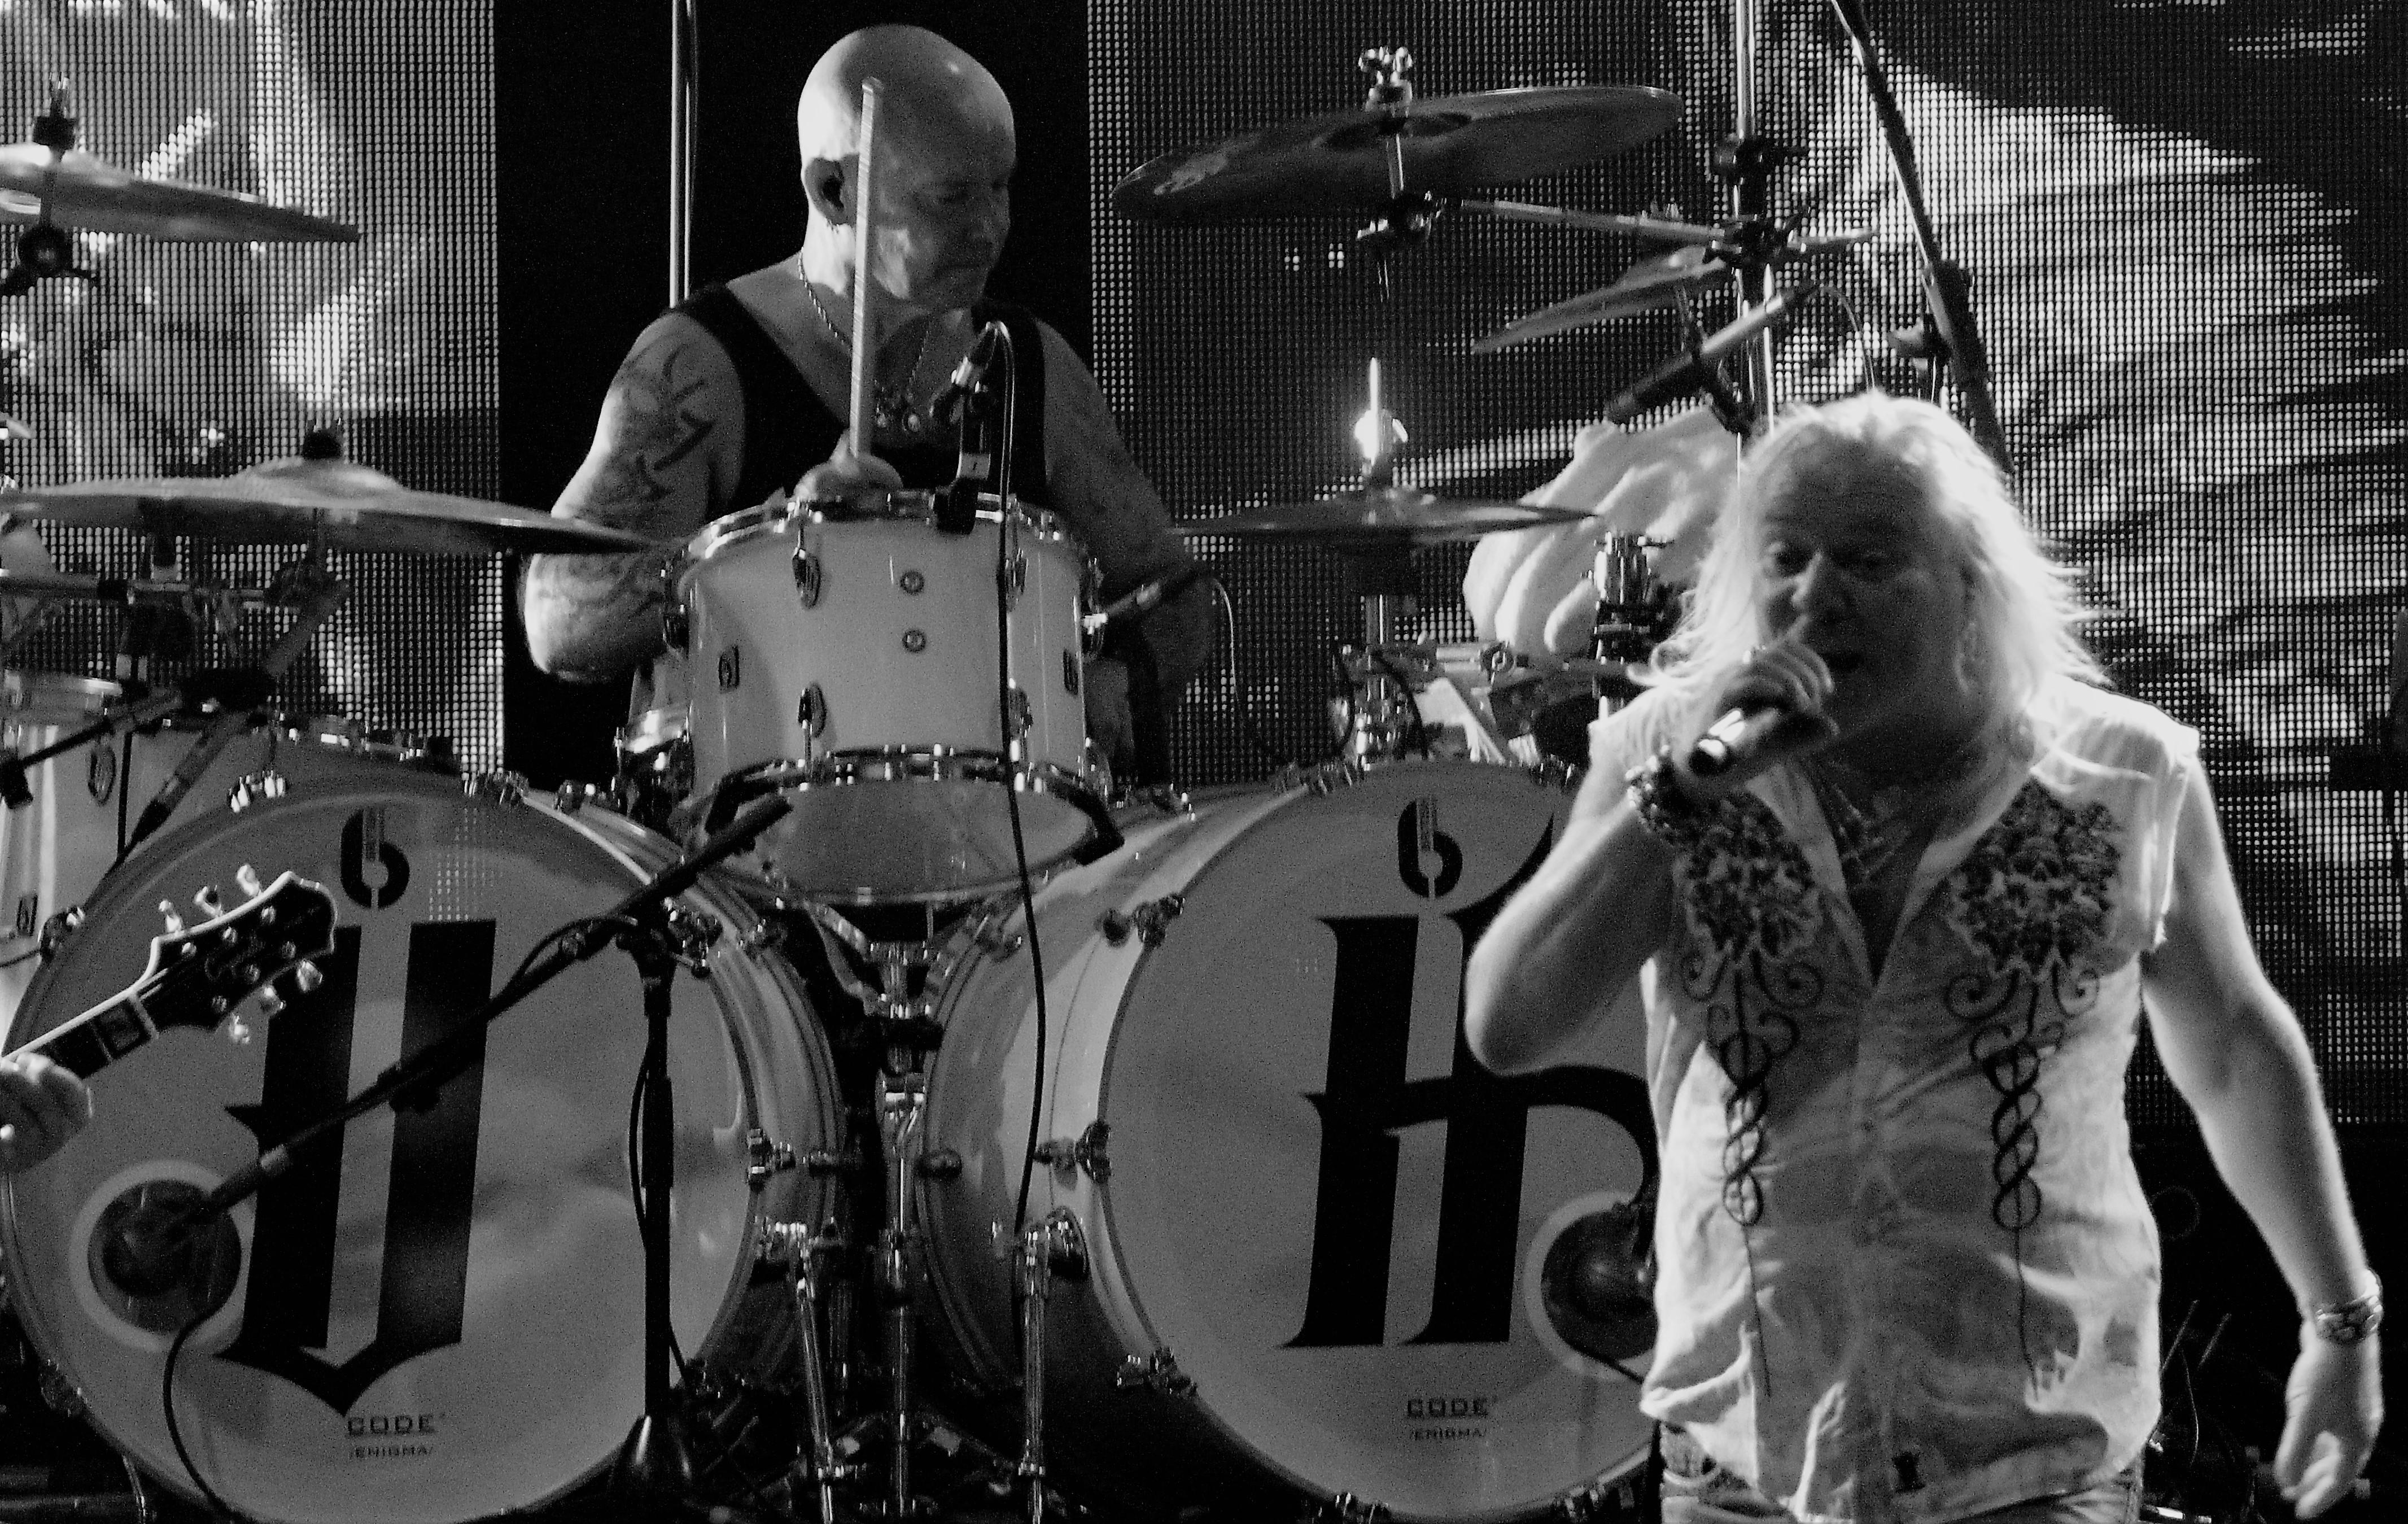 Day 2 - Main Stage_6 - Uriah Heep (19)